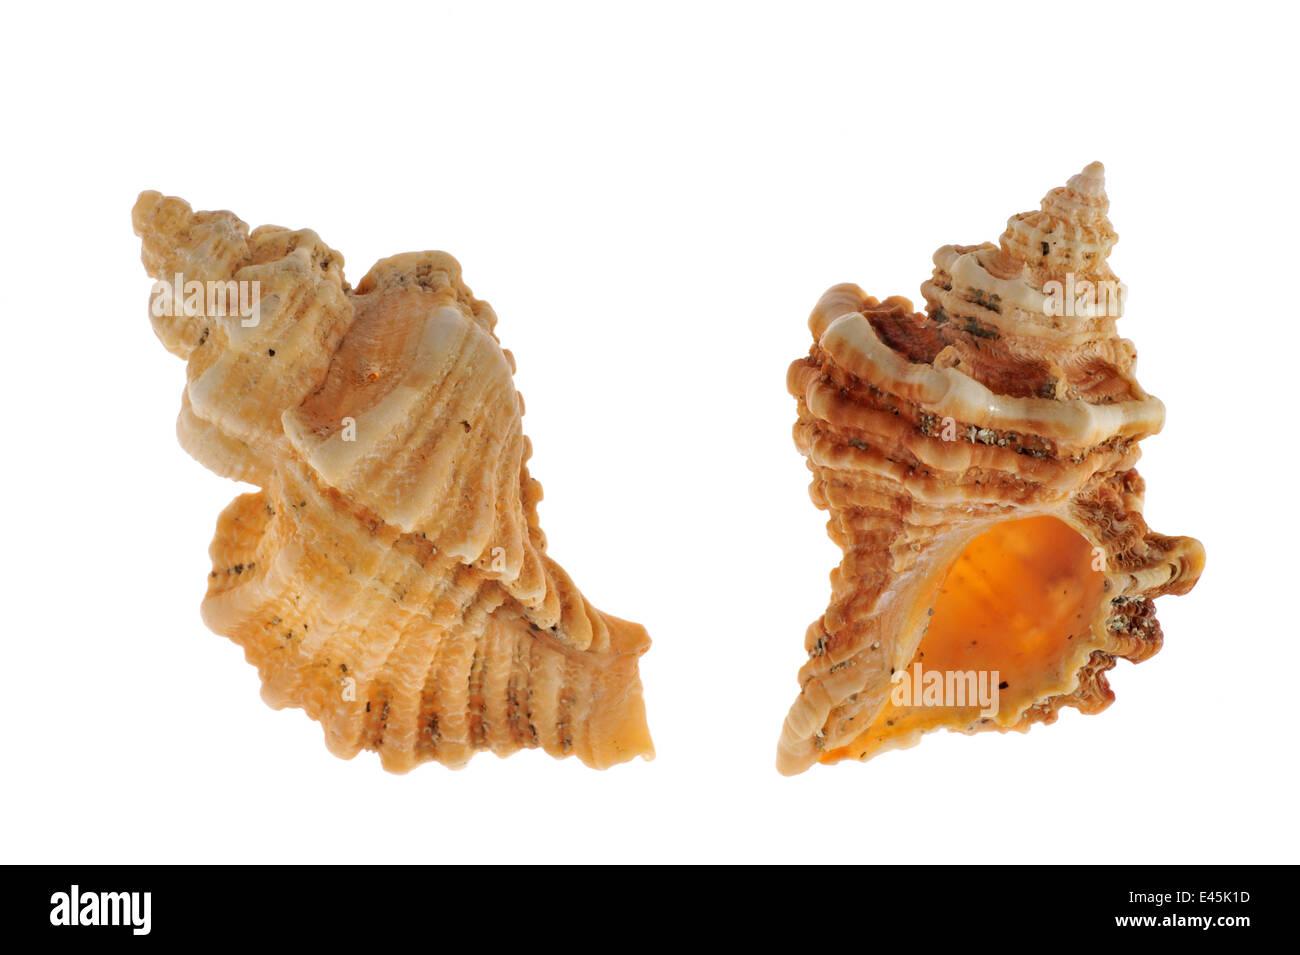 Sting winkle / Oyster drill / Hedgehog Murex (Ocenebra erinacea) shells, Brittany, France Stock Photo